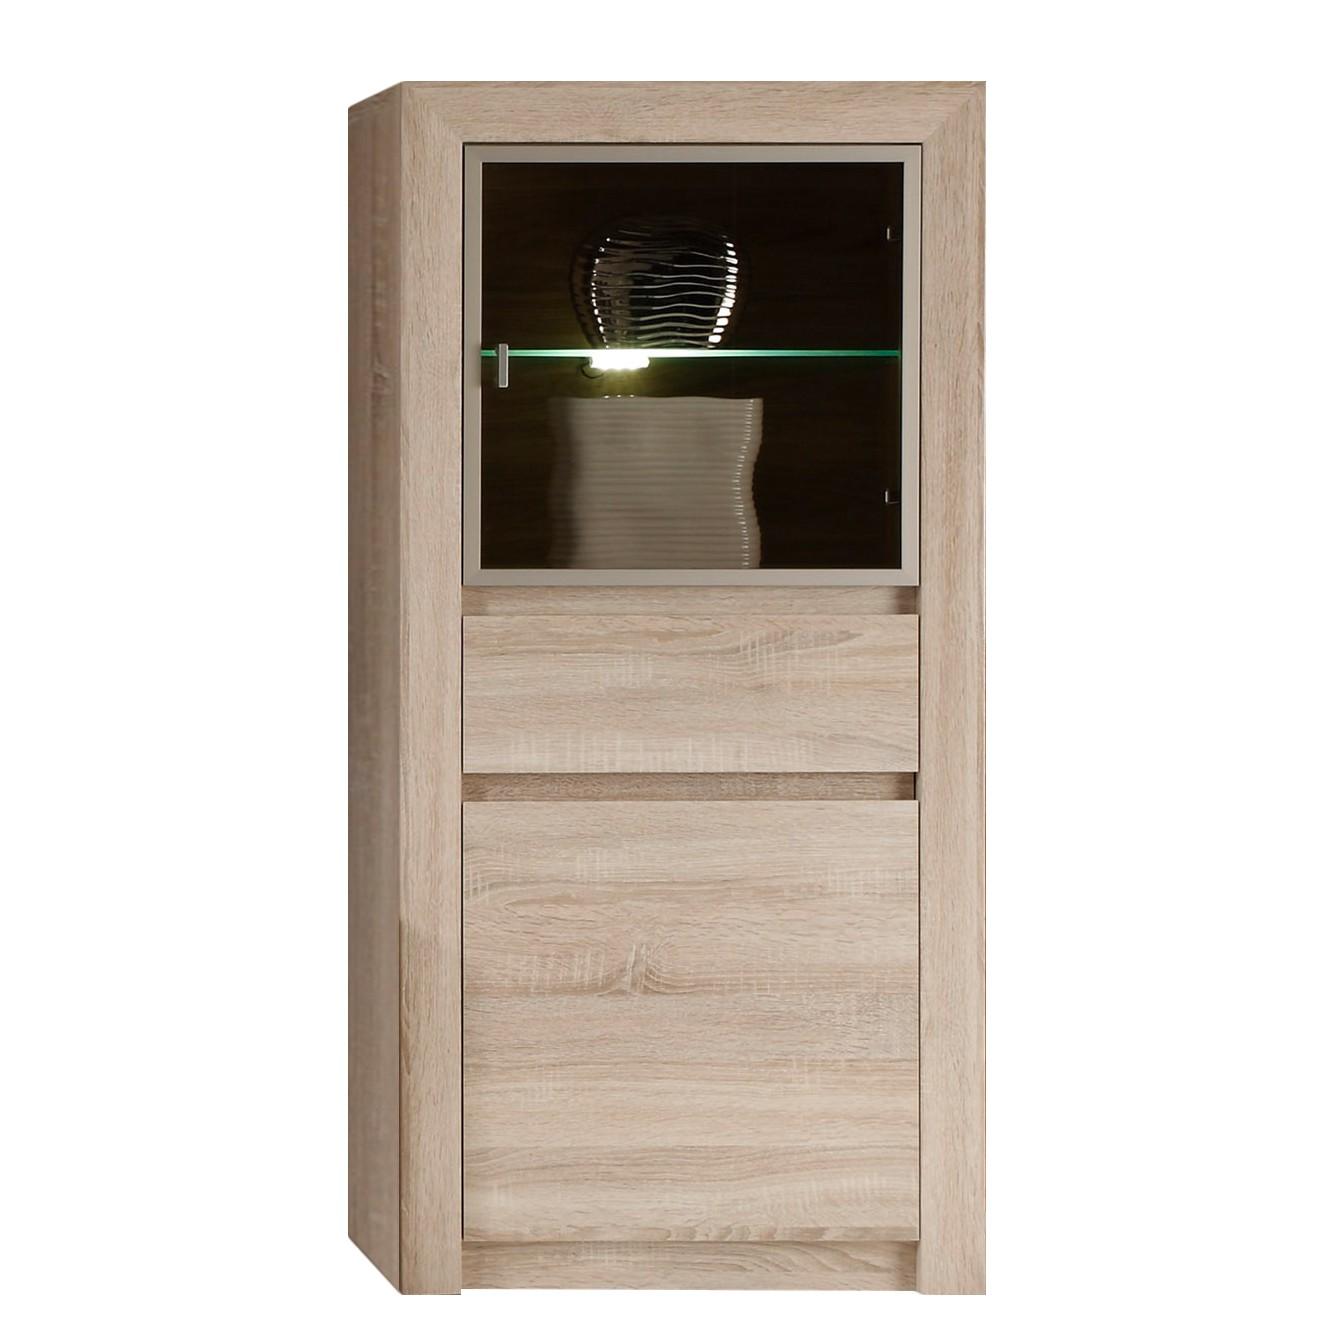 Home 24 - Eek a+, vitrine santandria i - avec éclairage imitation chêne clair sonoma, trendteam